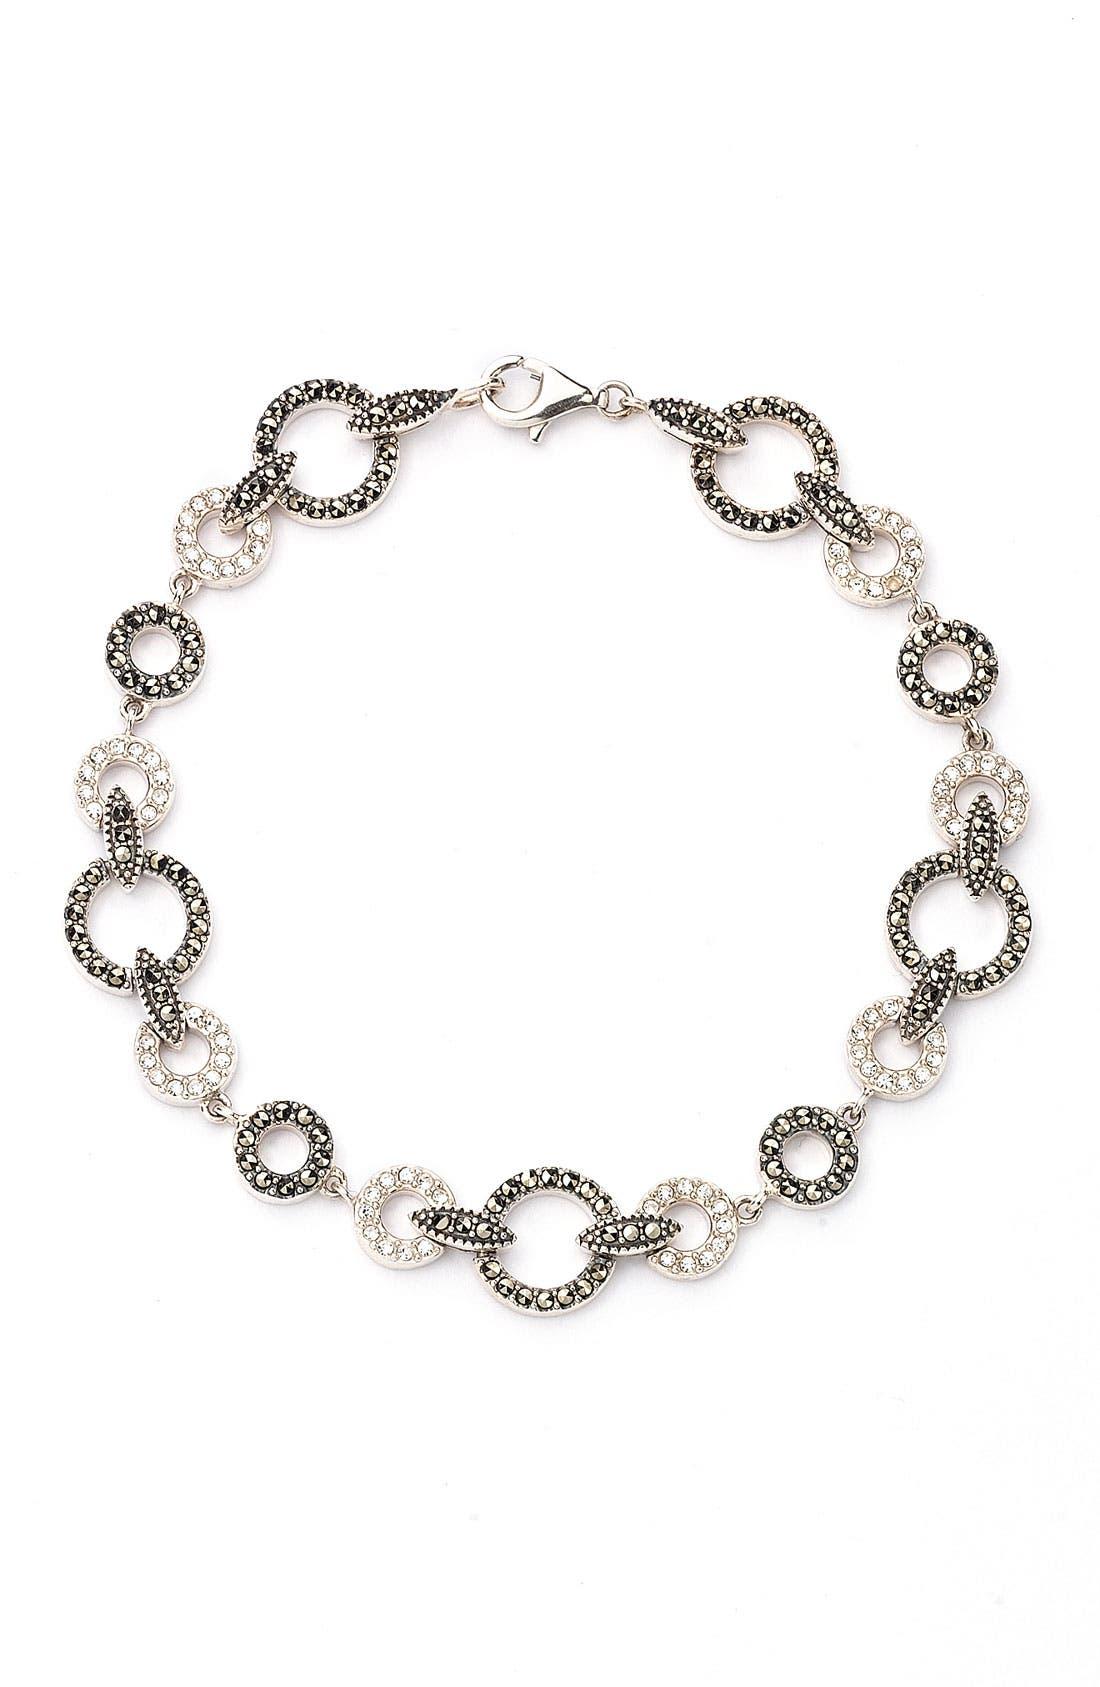 Main Image - Judith Jack Circle Link Bracelet